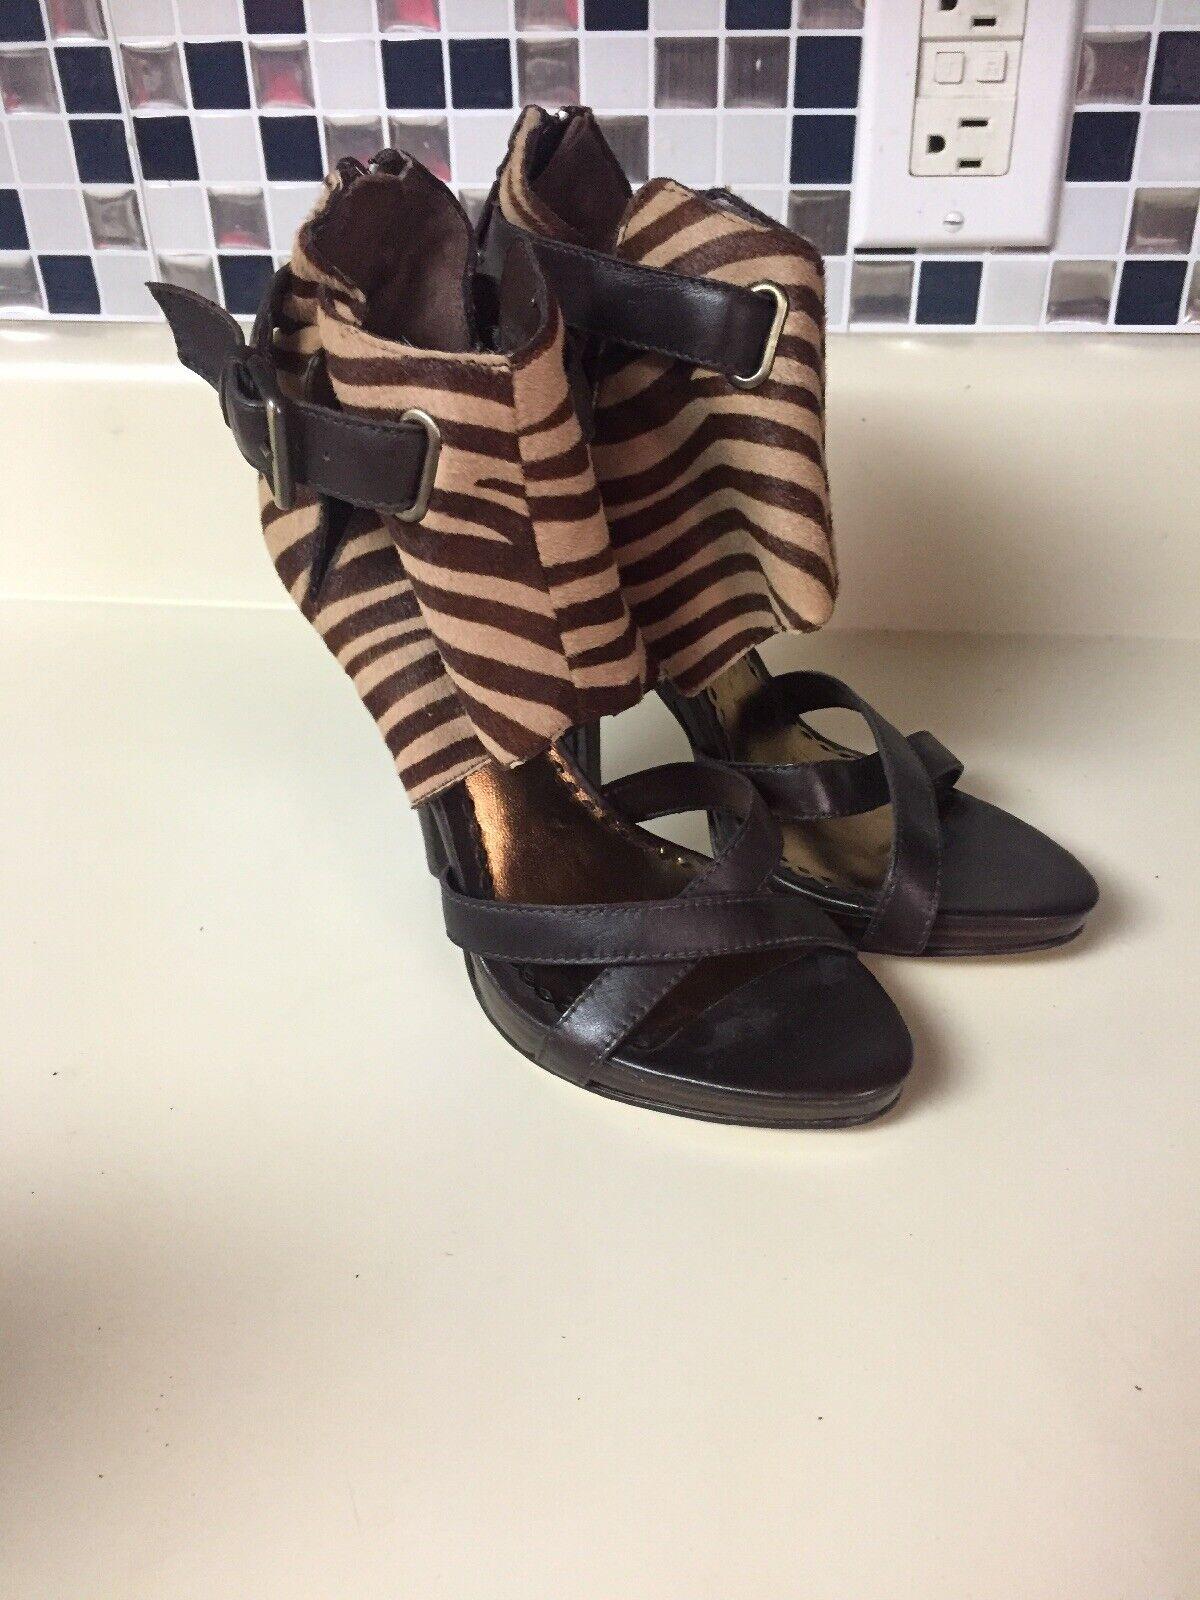 LL Bebe Platform Stilettos Sandals Heels Sz 6 Pony Hair Zebra Brown Leather